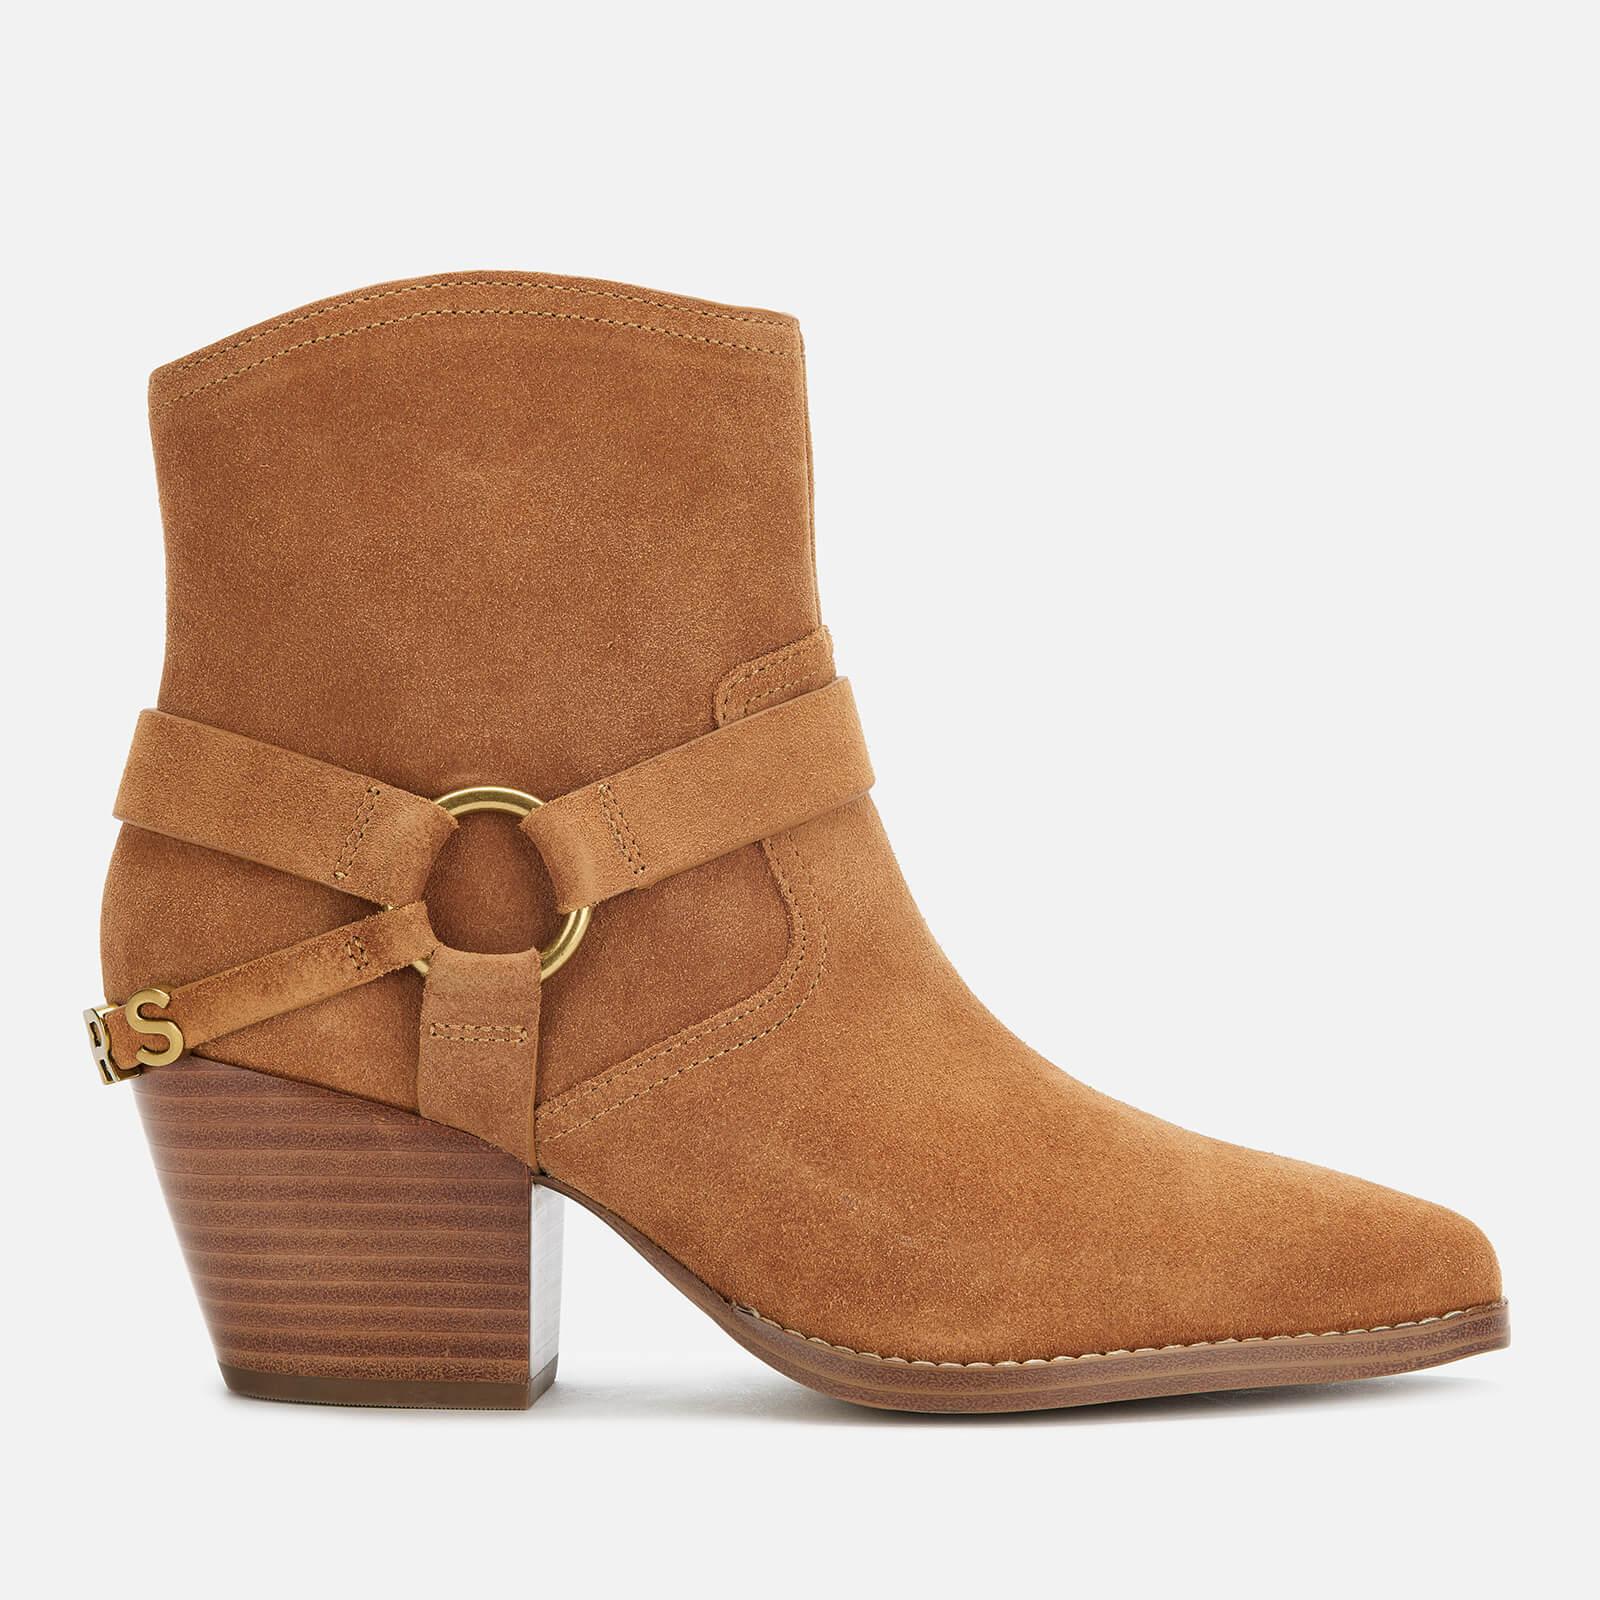 MICHAEL MICHAEL KORS Women's Goldie Suede Western Boots - Acorn - UK 7/US 10 - Tan